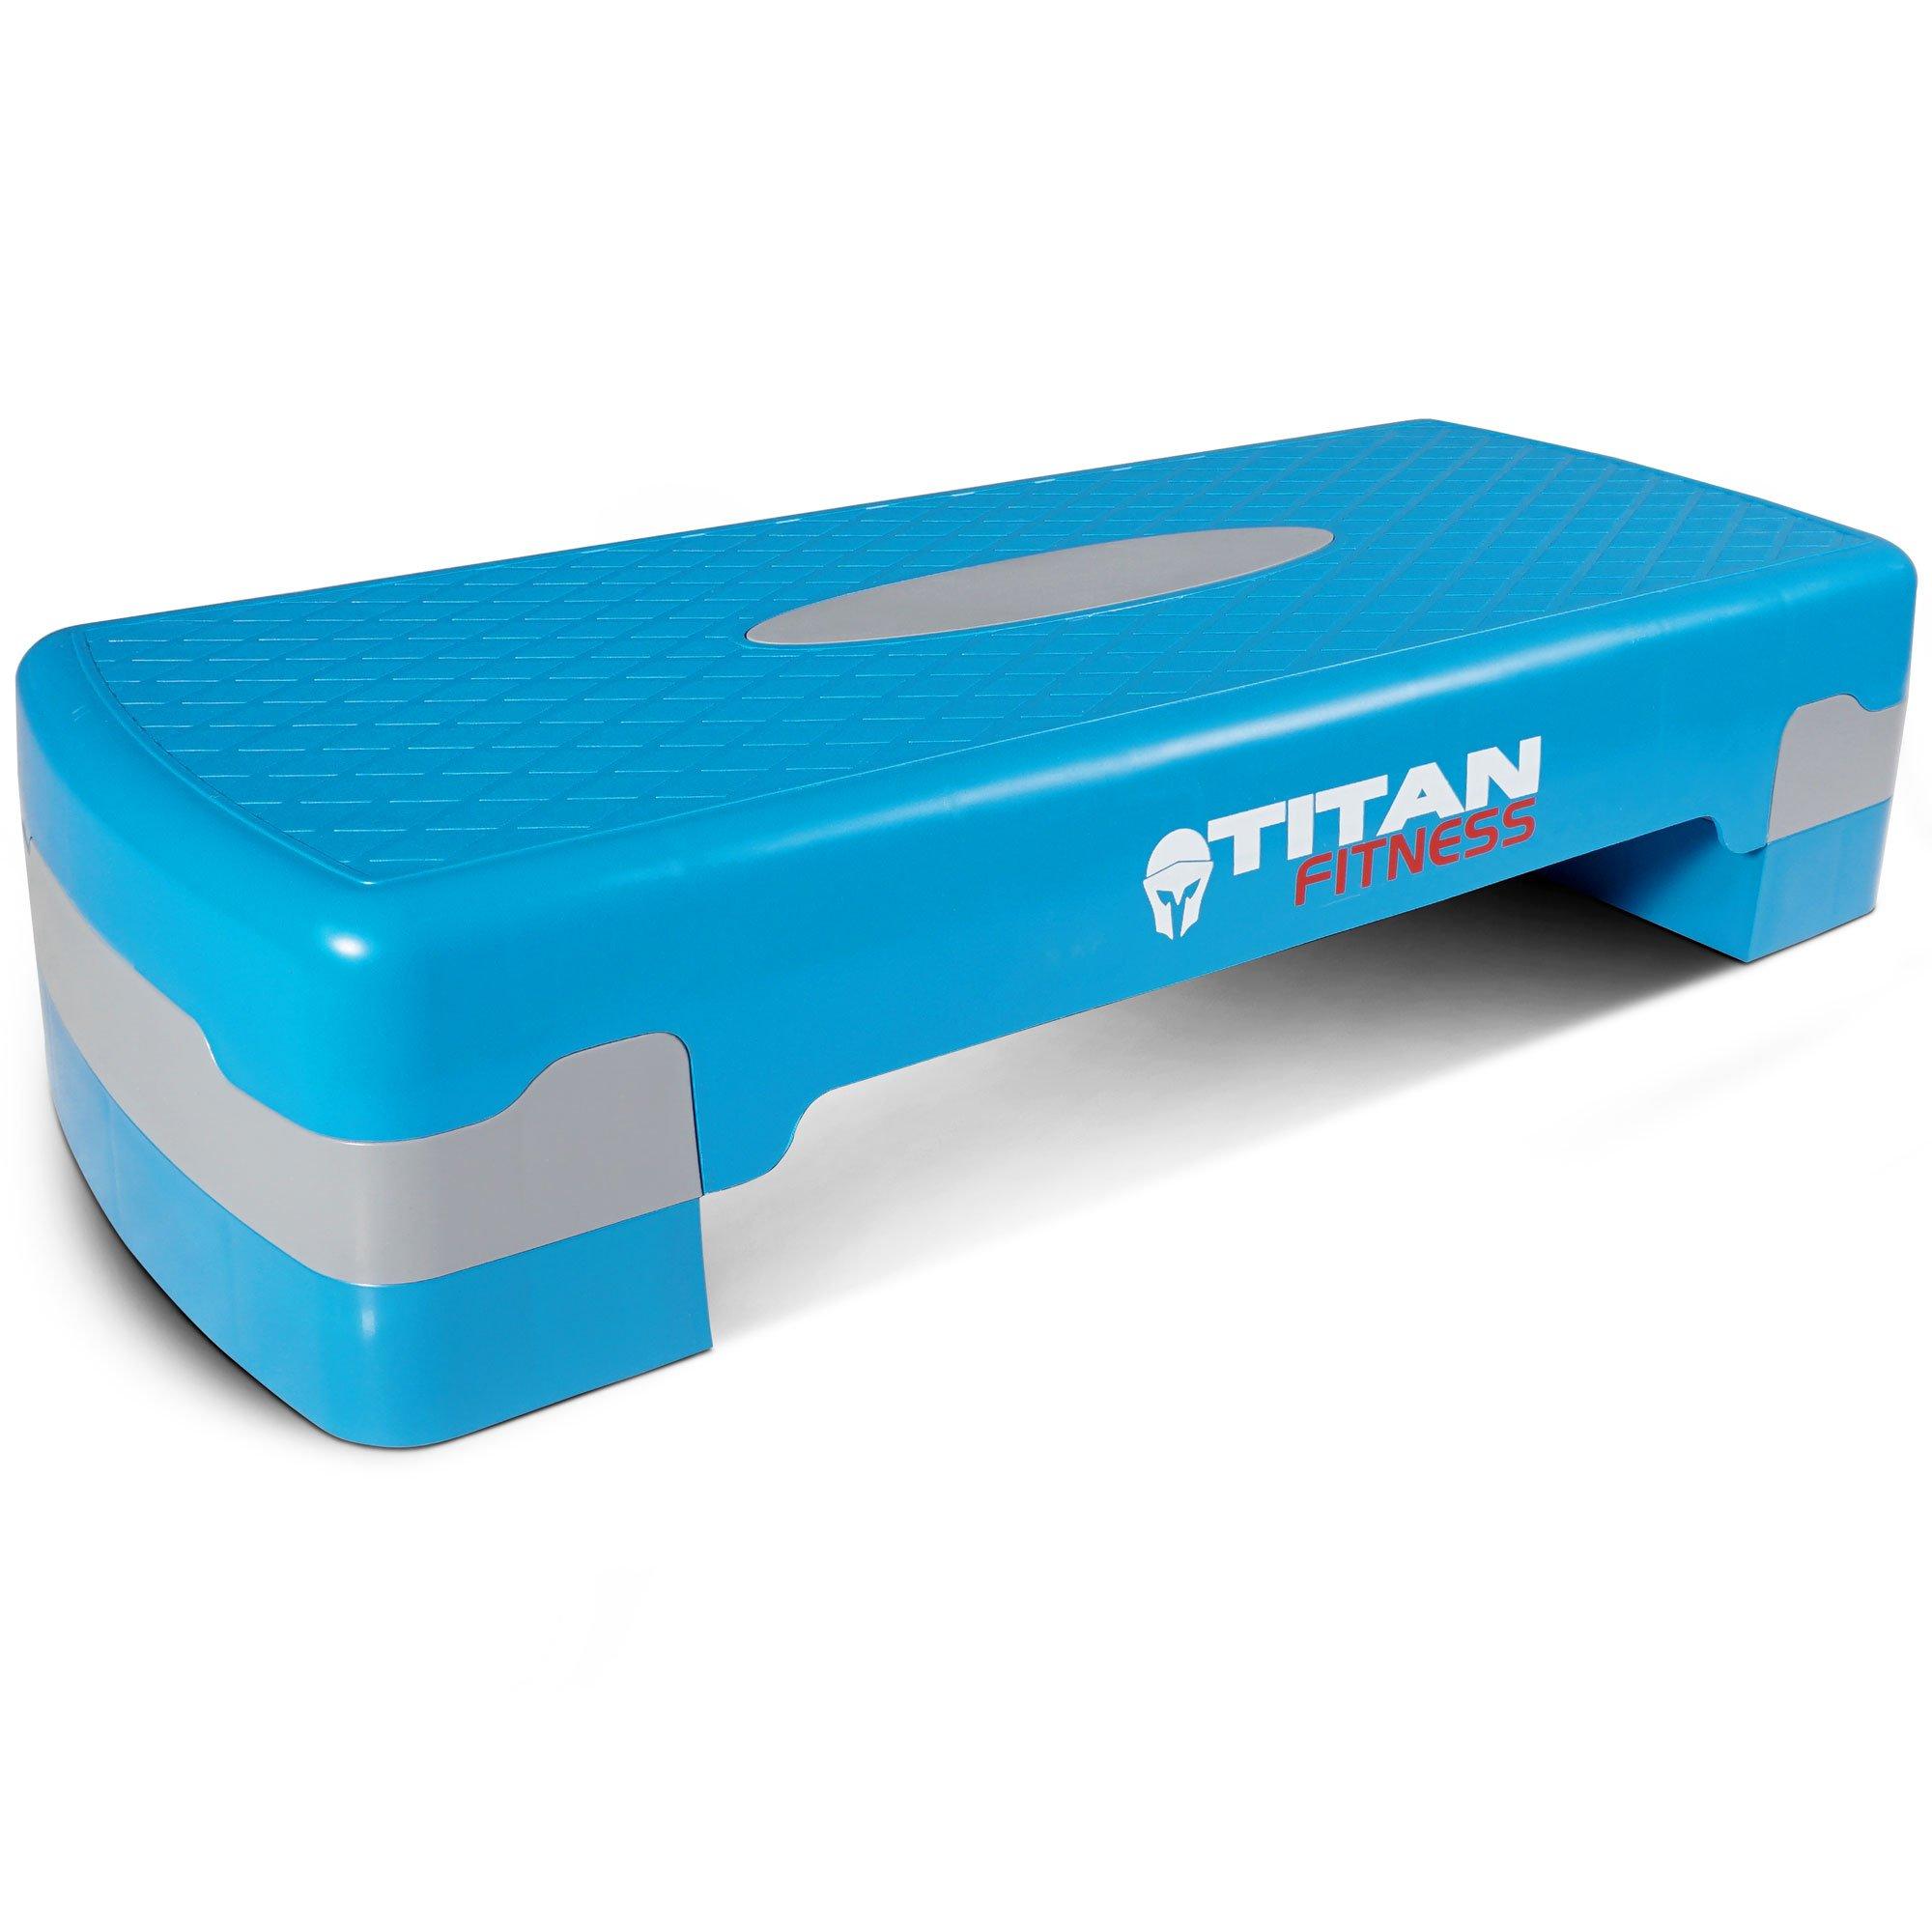 Titan Fitness Aerobic Step 27'' Stepper w/Risers Cardio Adjust 4'' - 6'' Exercise